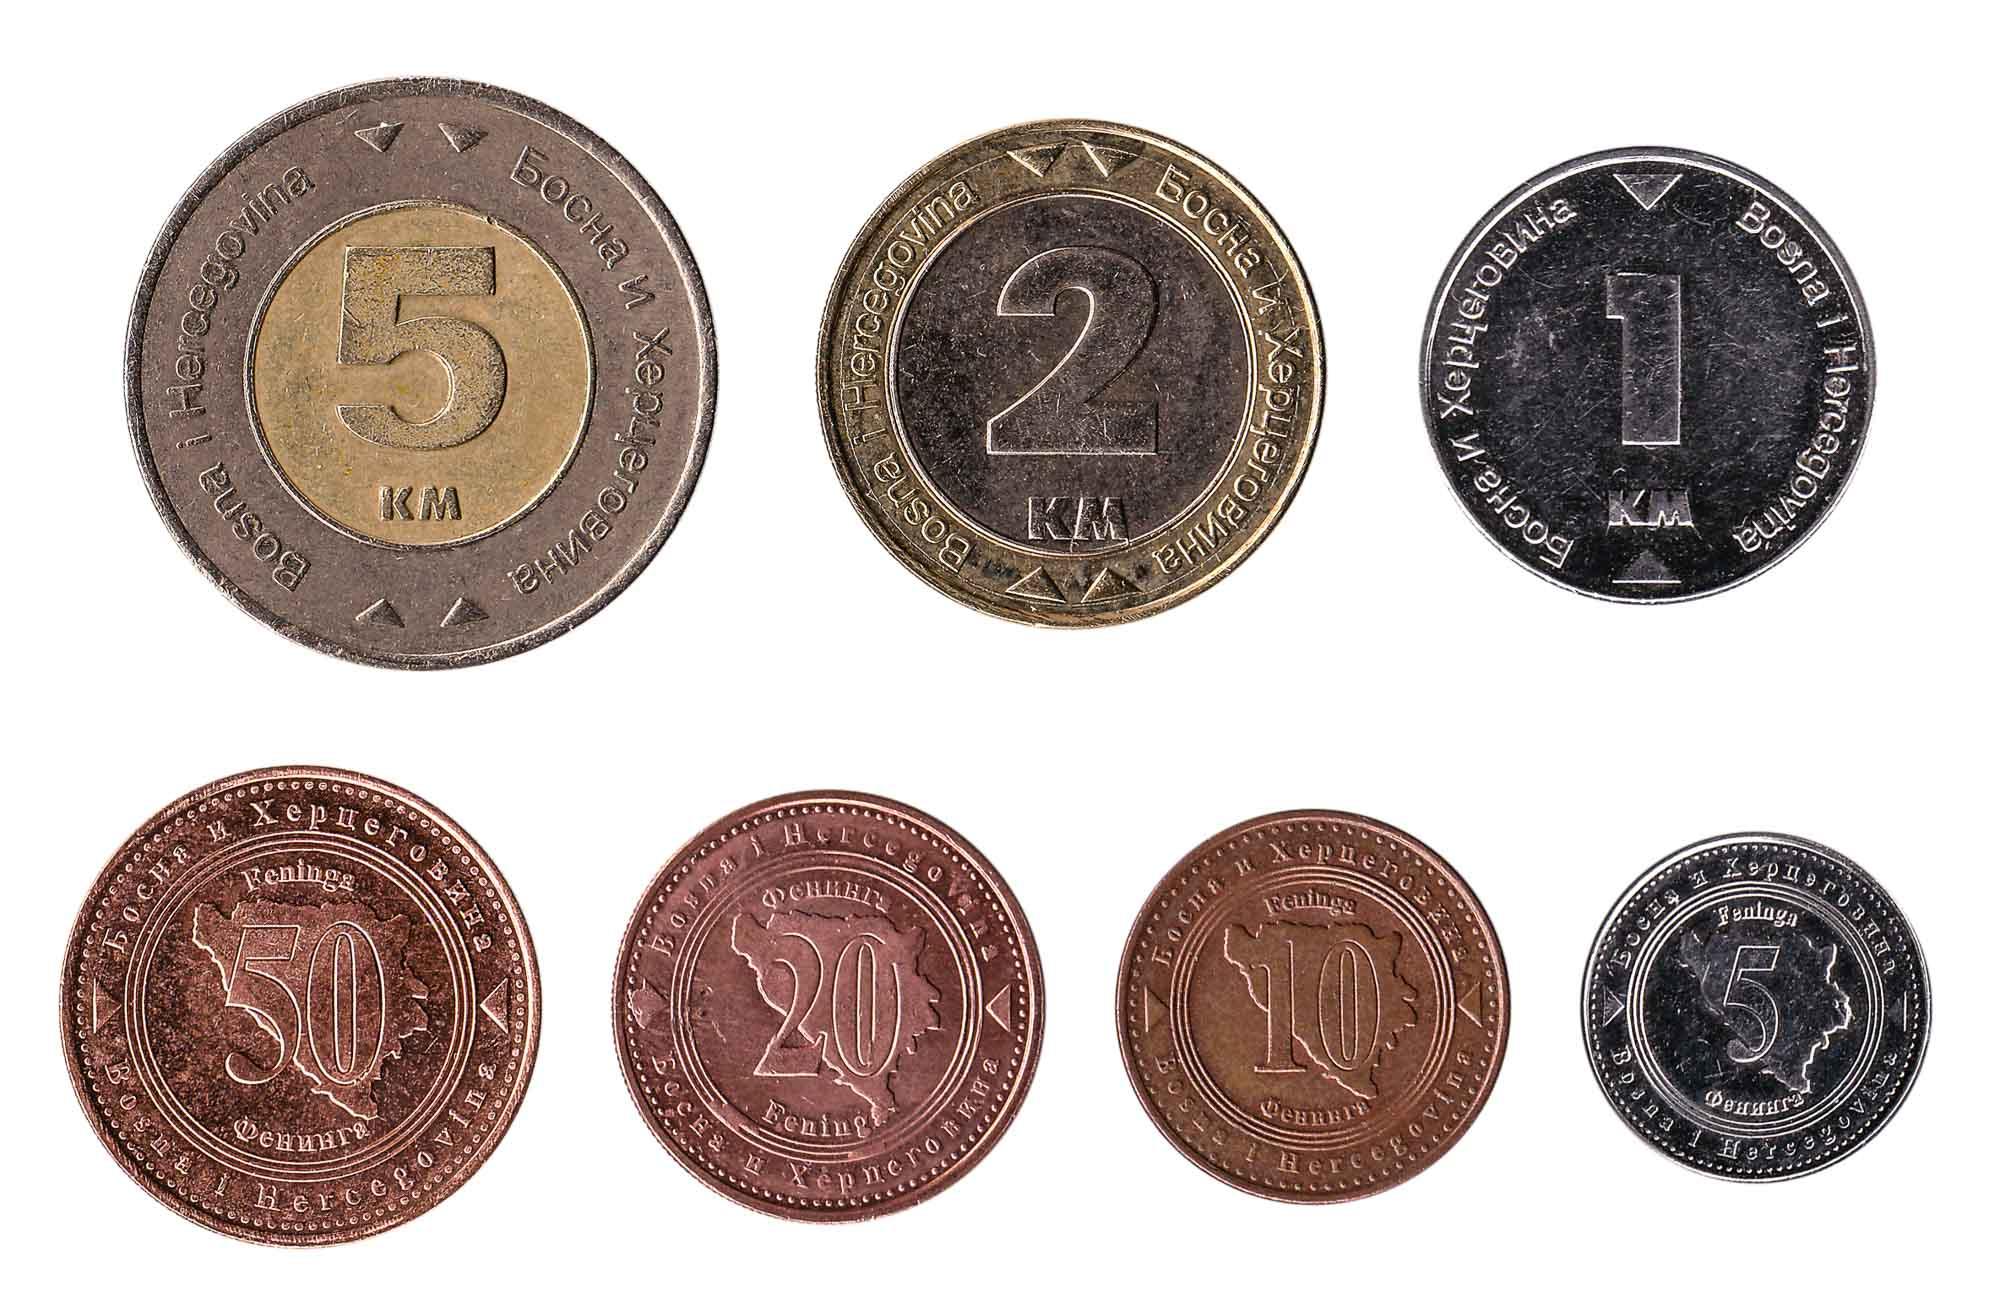 Bosnia and Herzegovina convertible mark coins